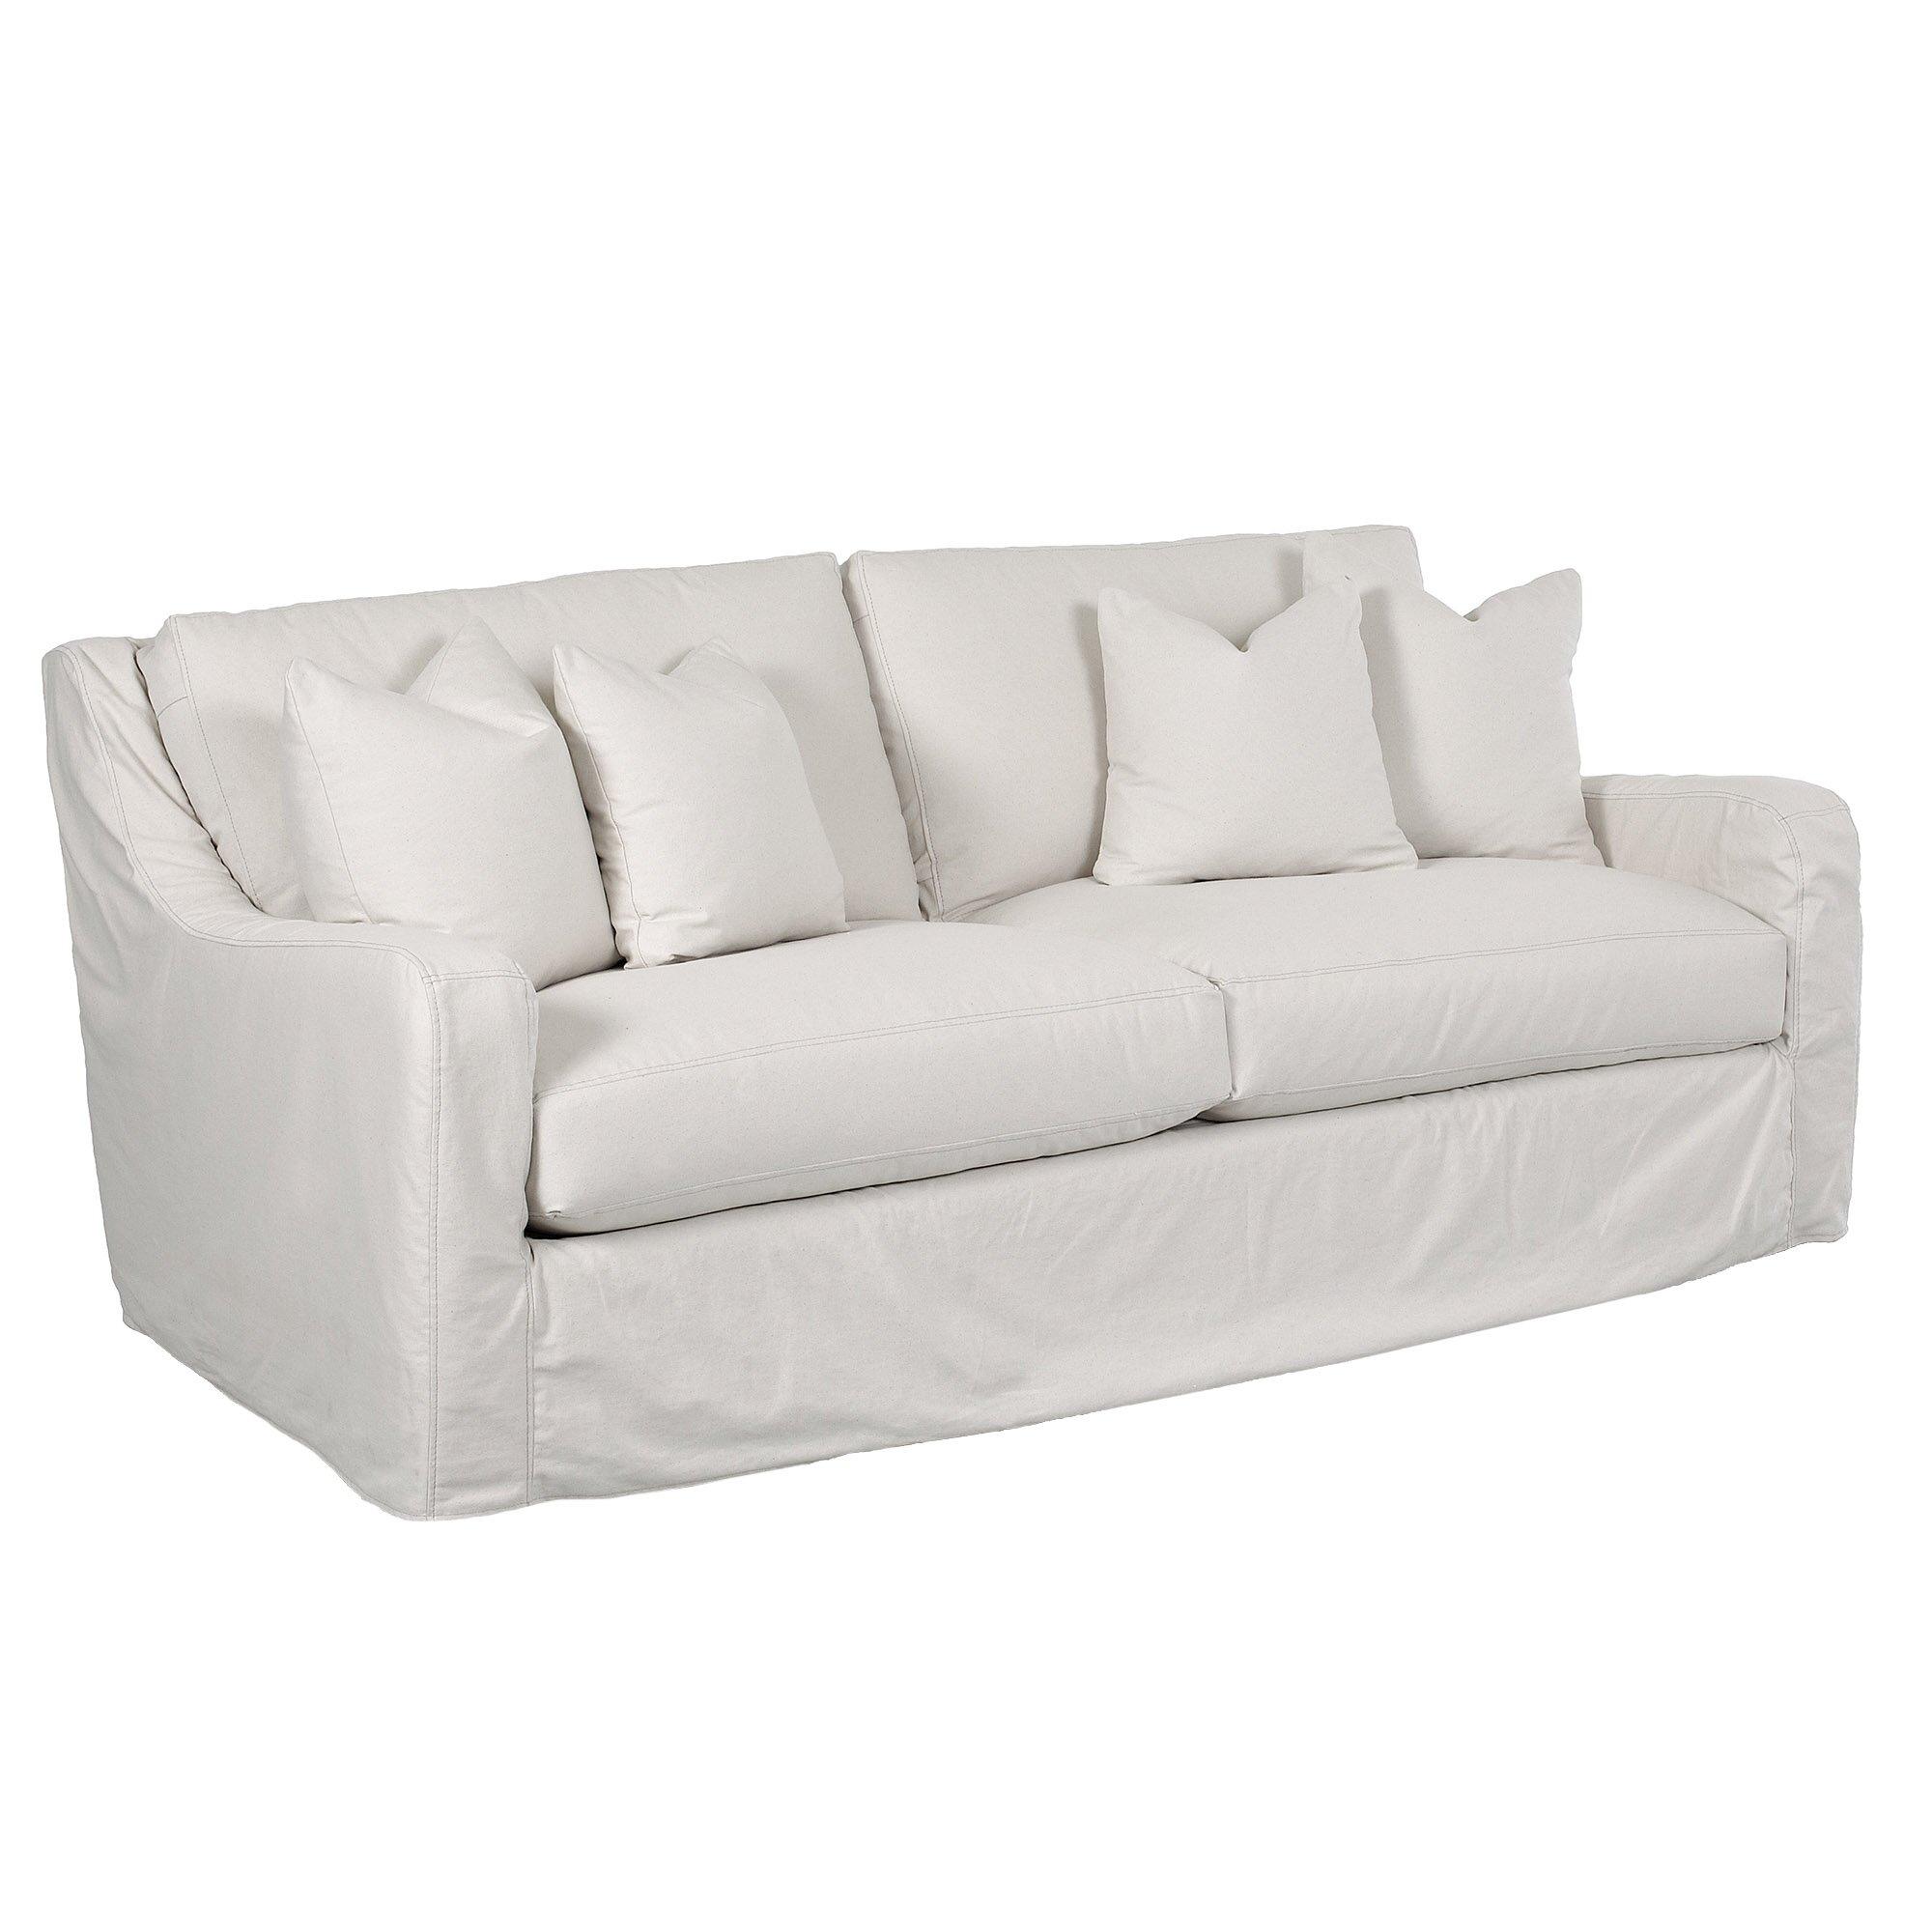 Wayfair Custom Upholstery Maggie Sofa Reviews